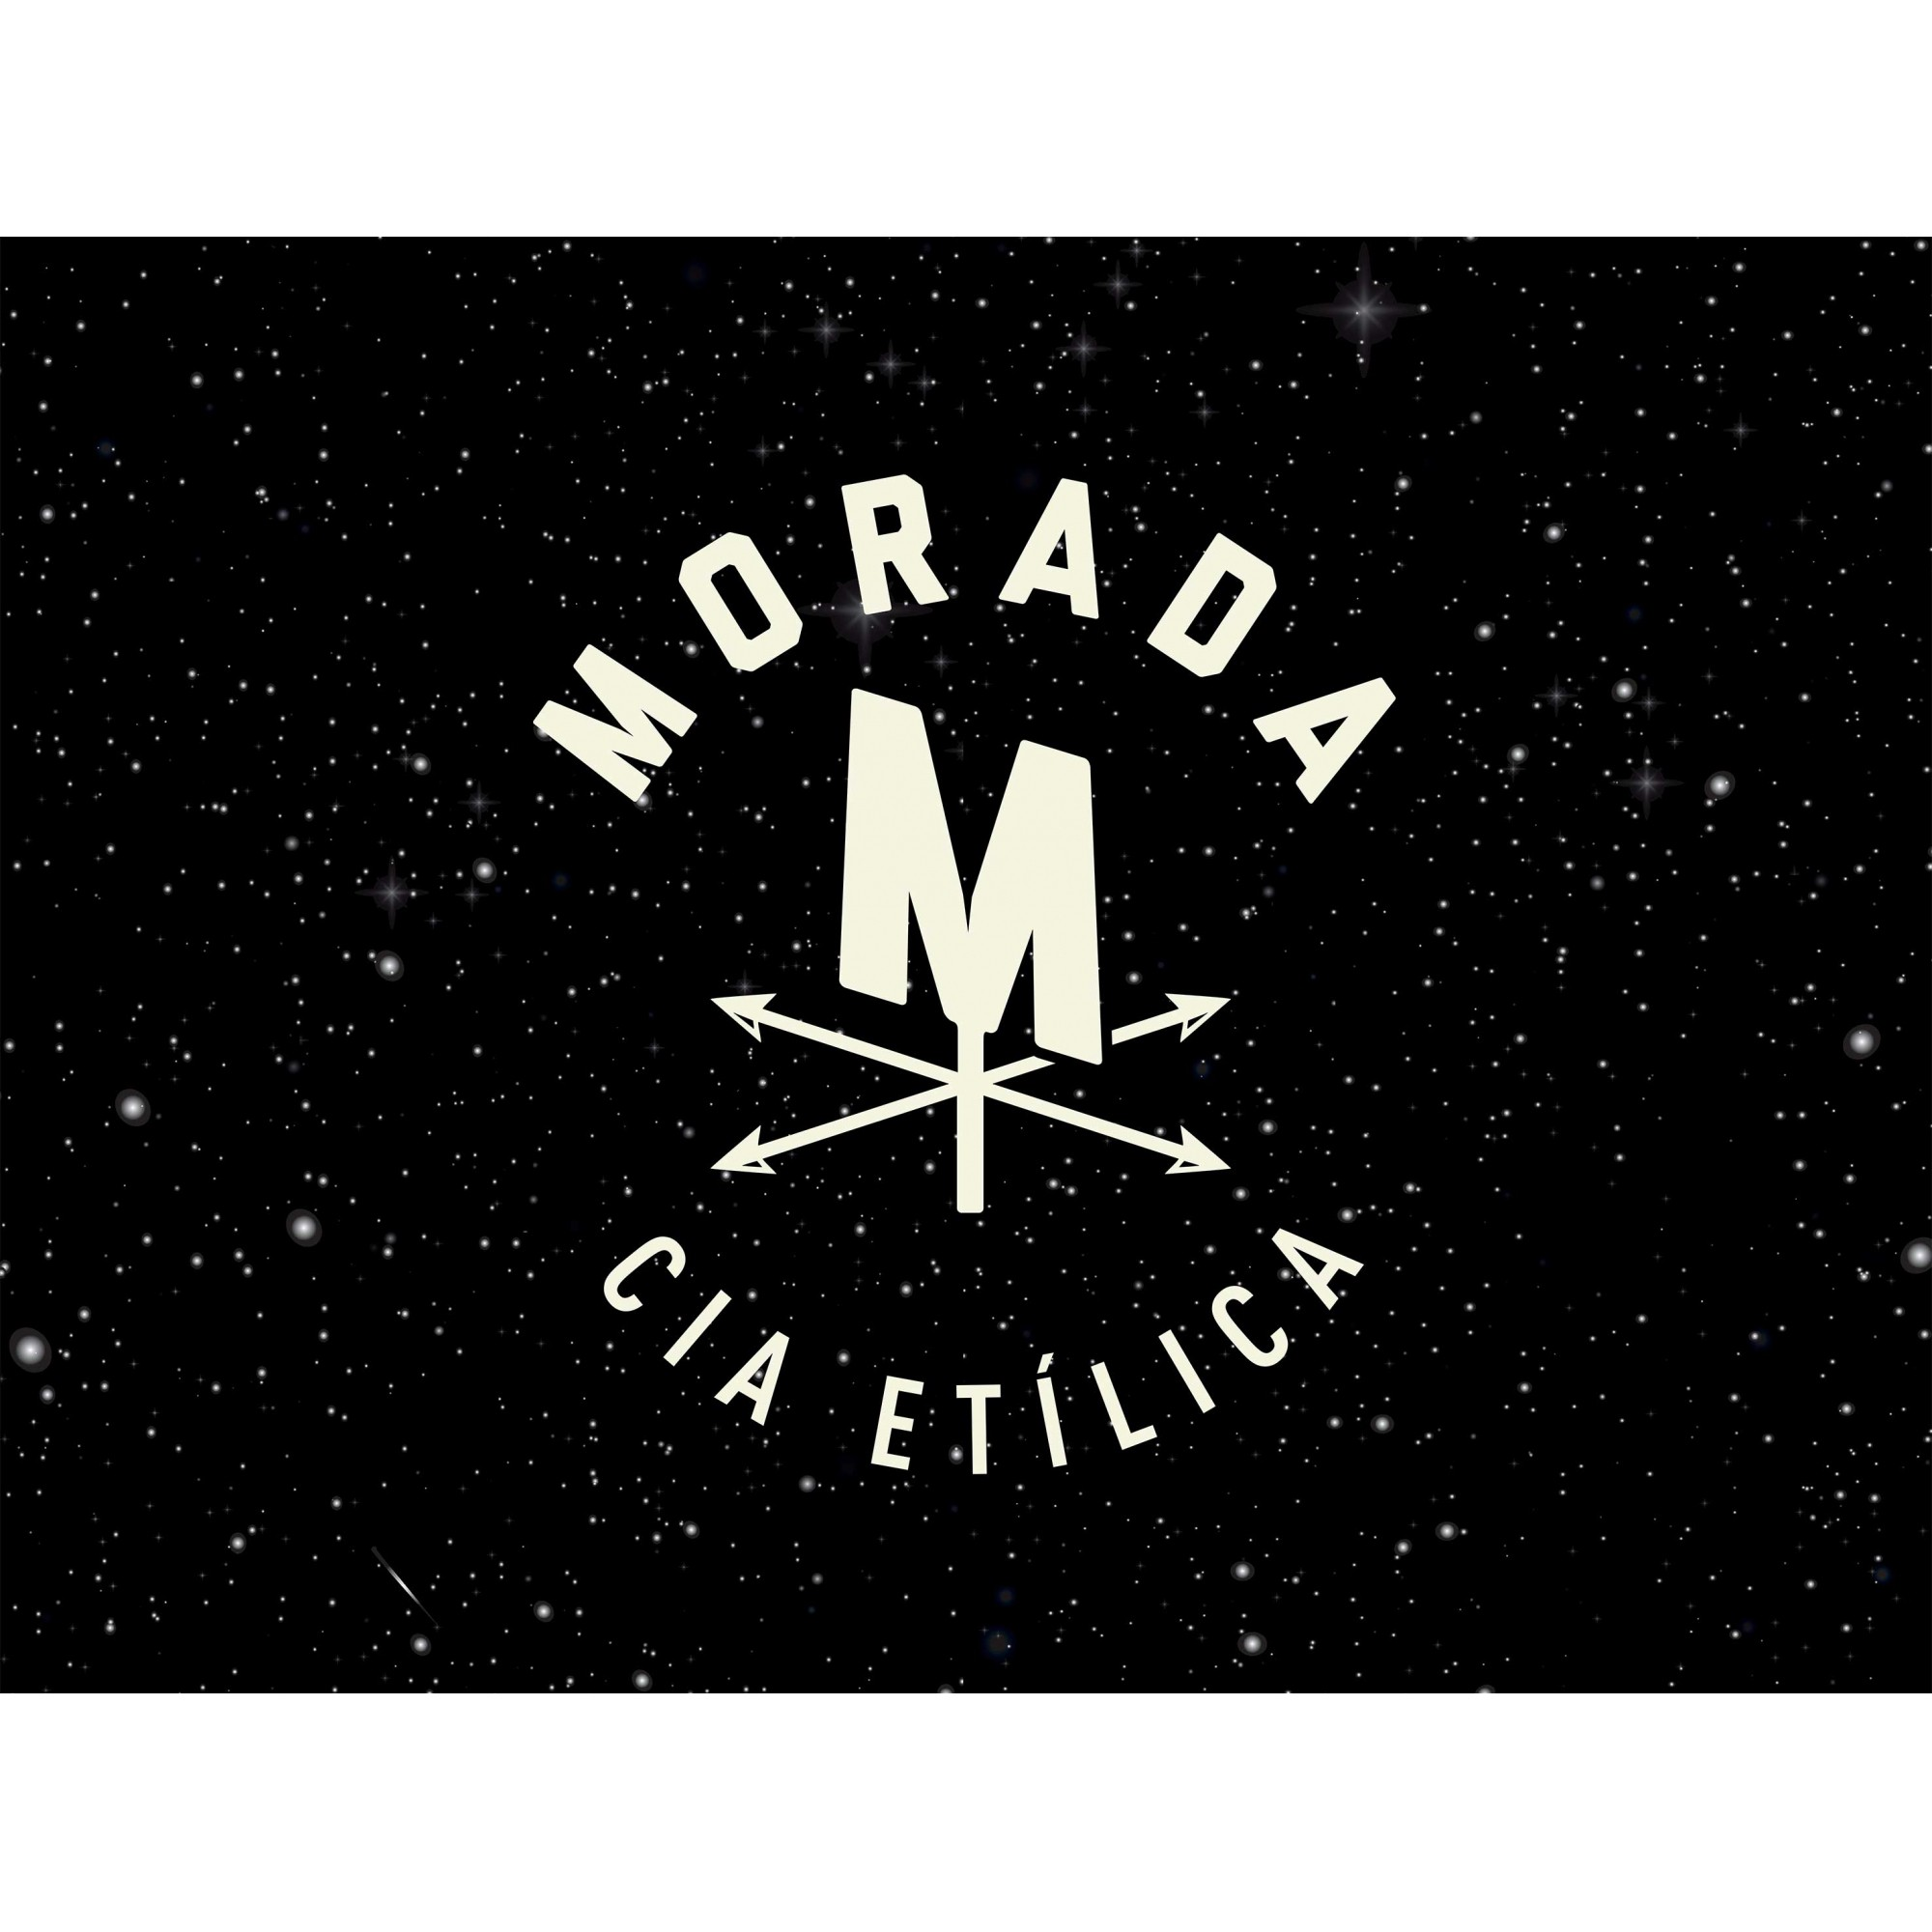 Espumante Natural Chardonnay - Branco - Morada Cia Etílica